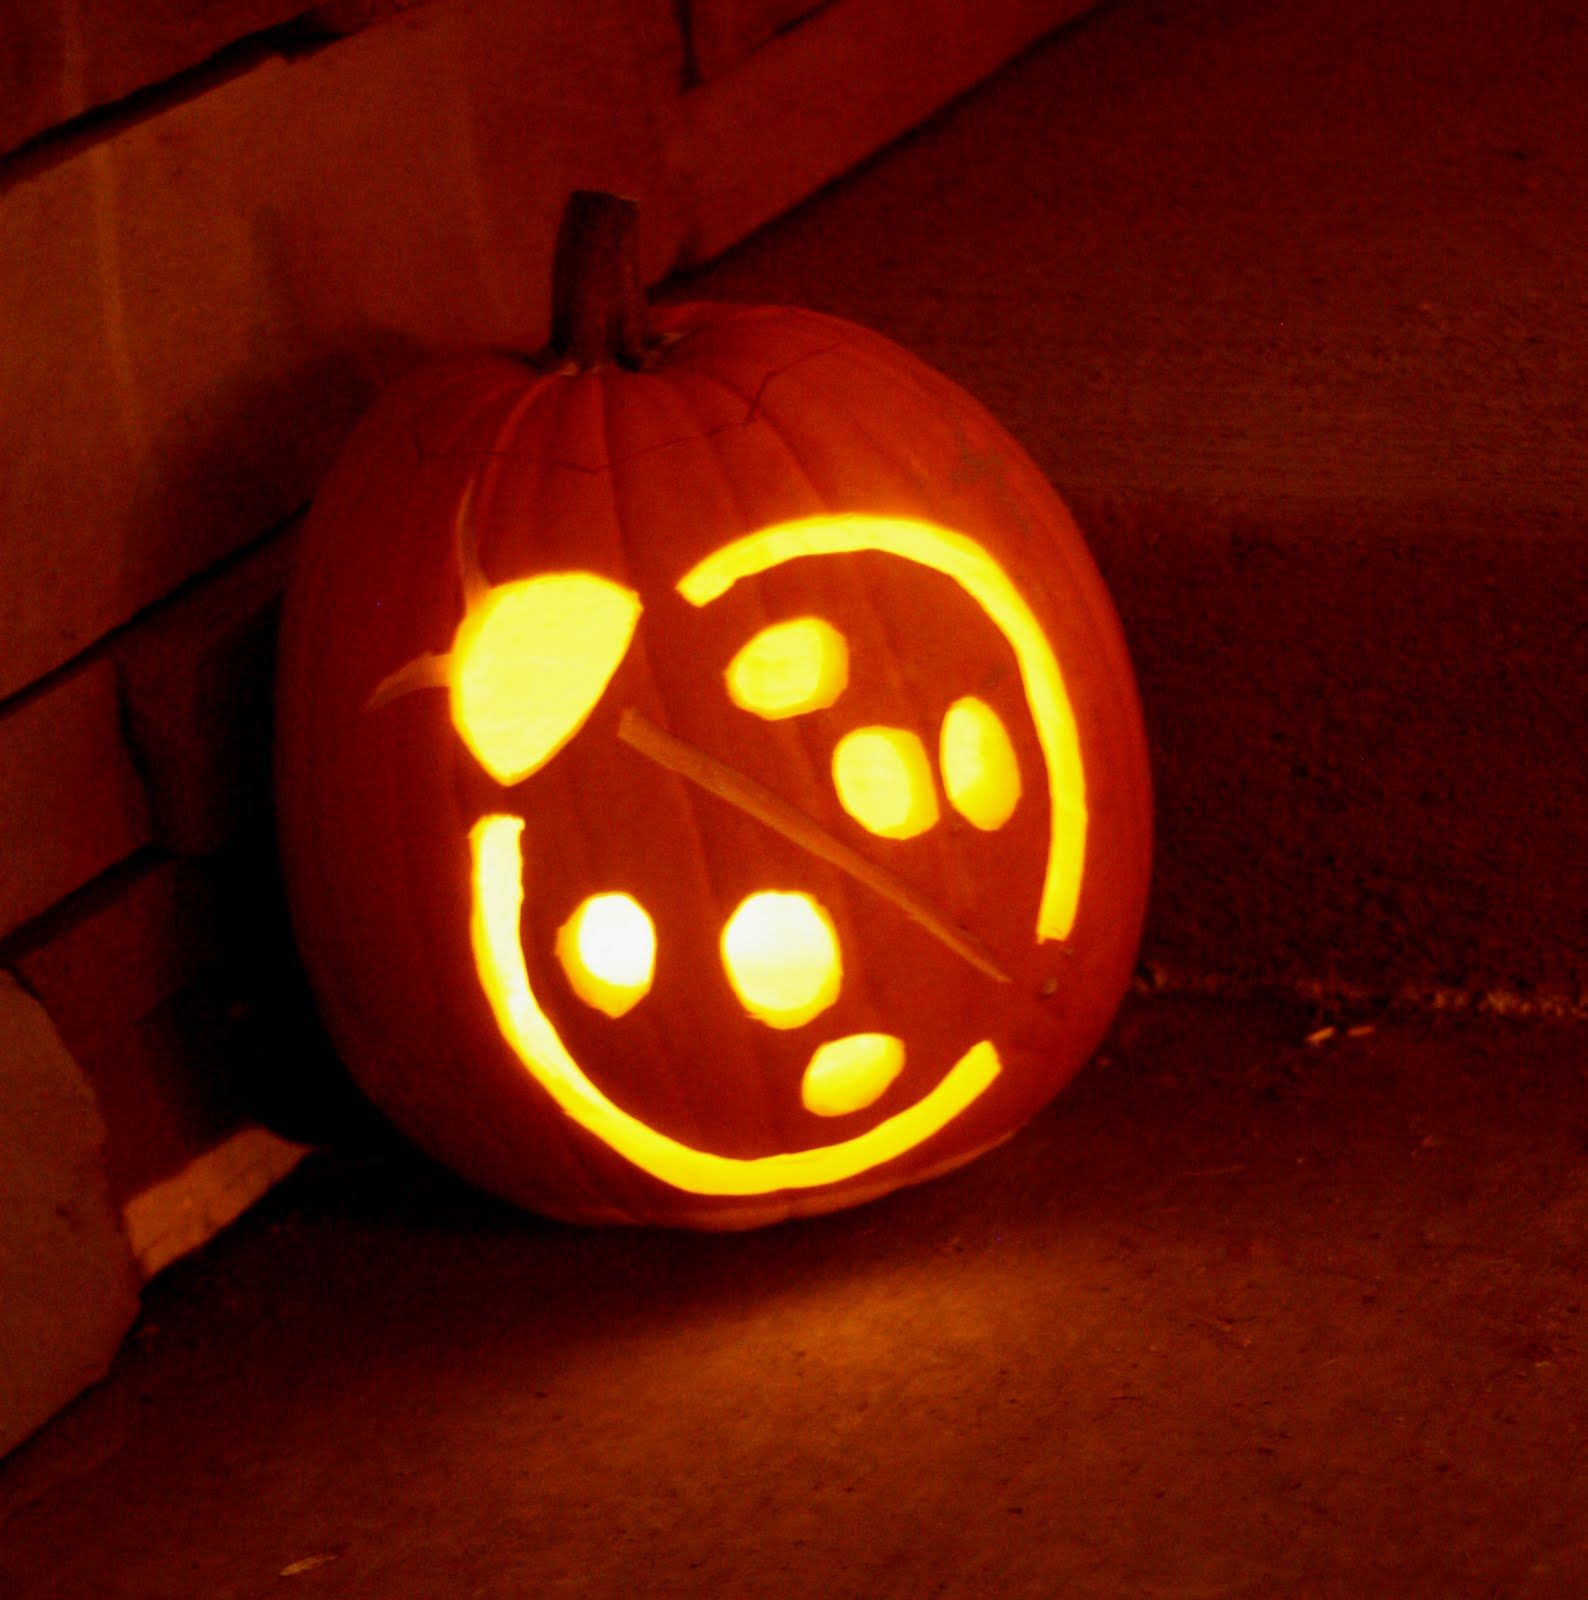 pumpkin template ladybug pumpkin stencil  pumpkin carving ladybug | out her pumpkin, the Bug was more ...